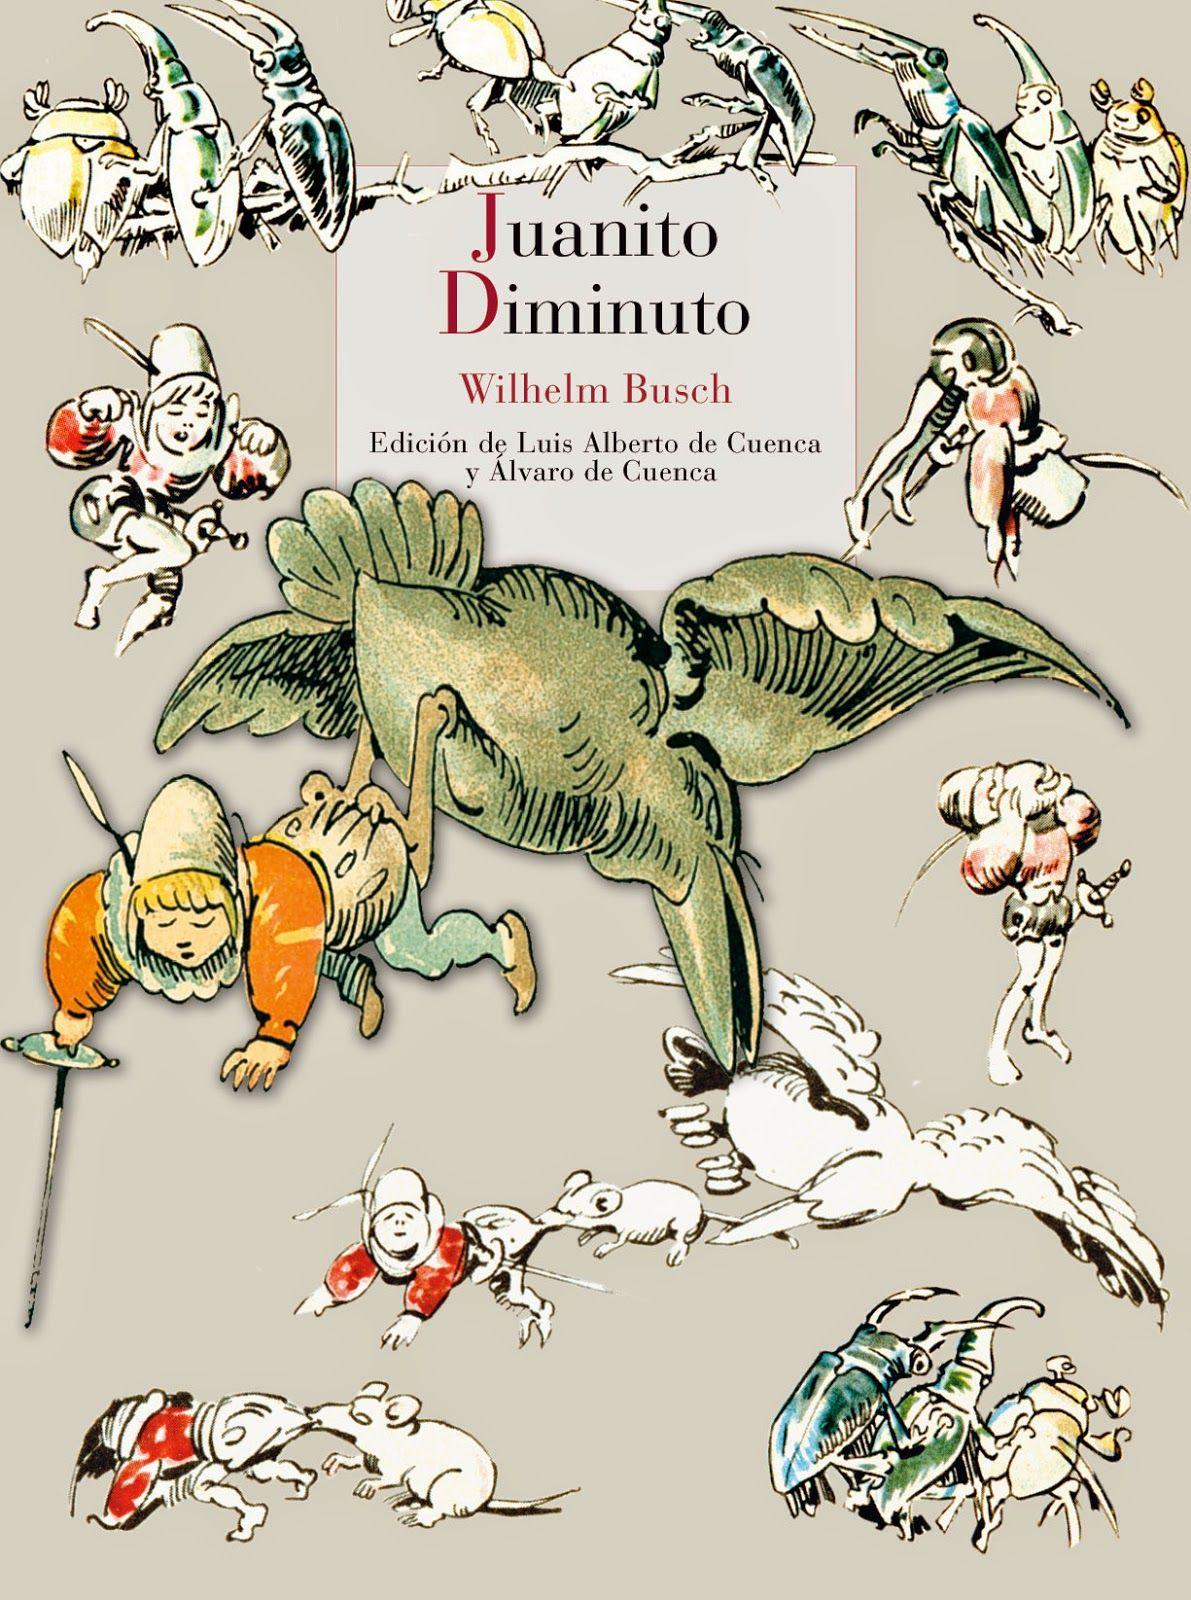 Juanito Diminuto